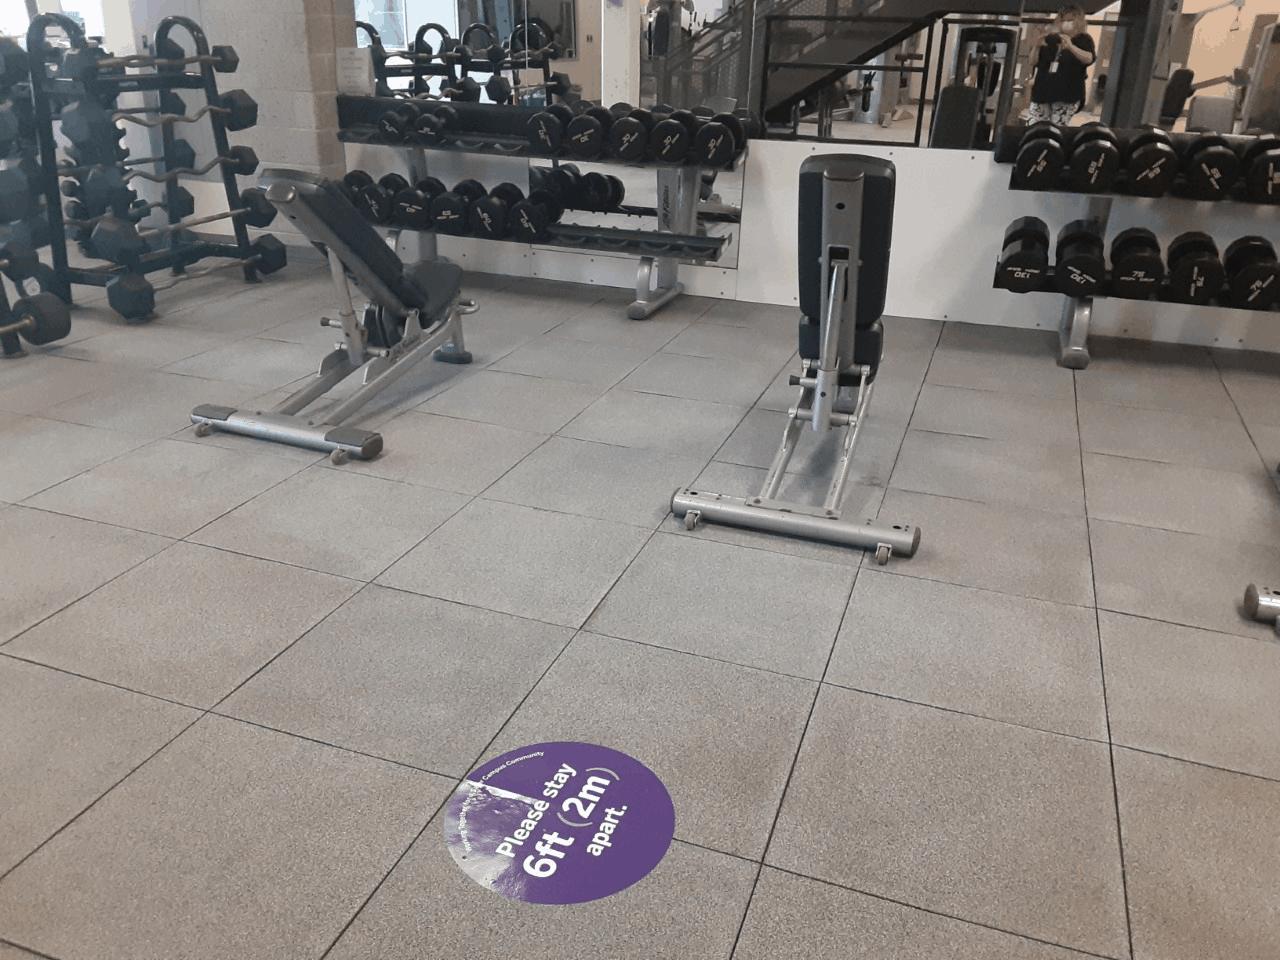 A photo of Western University's gym.